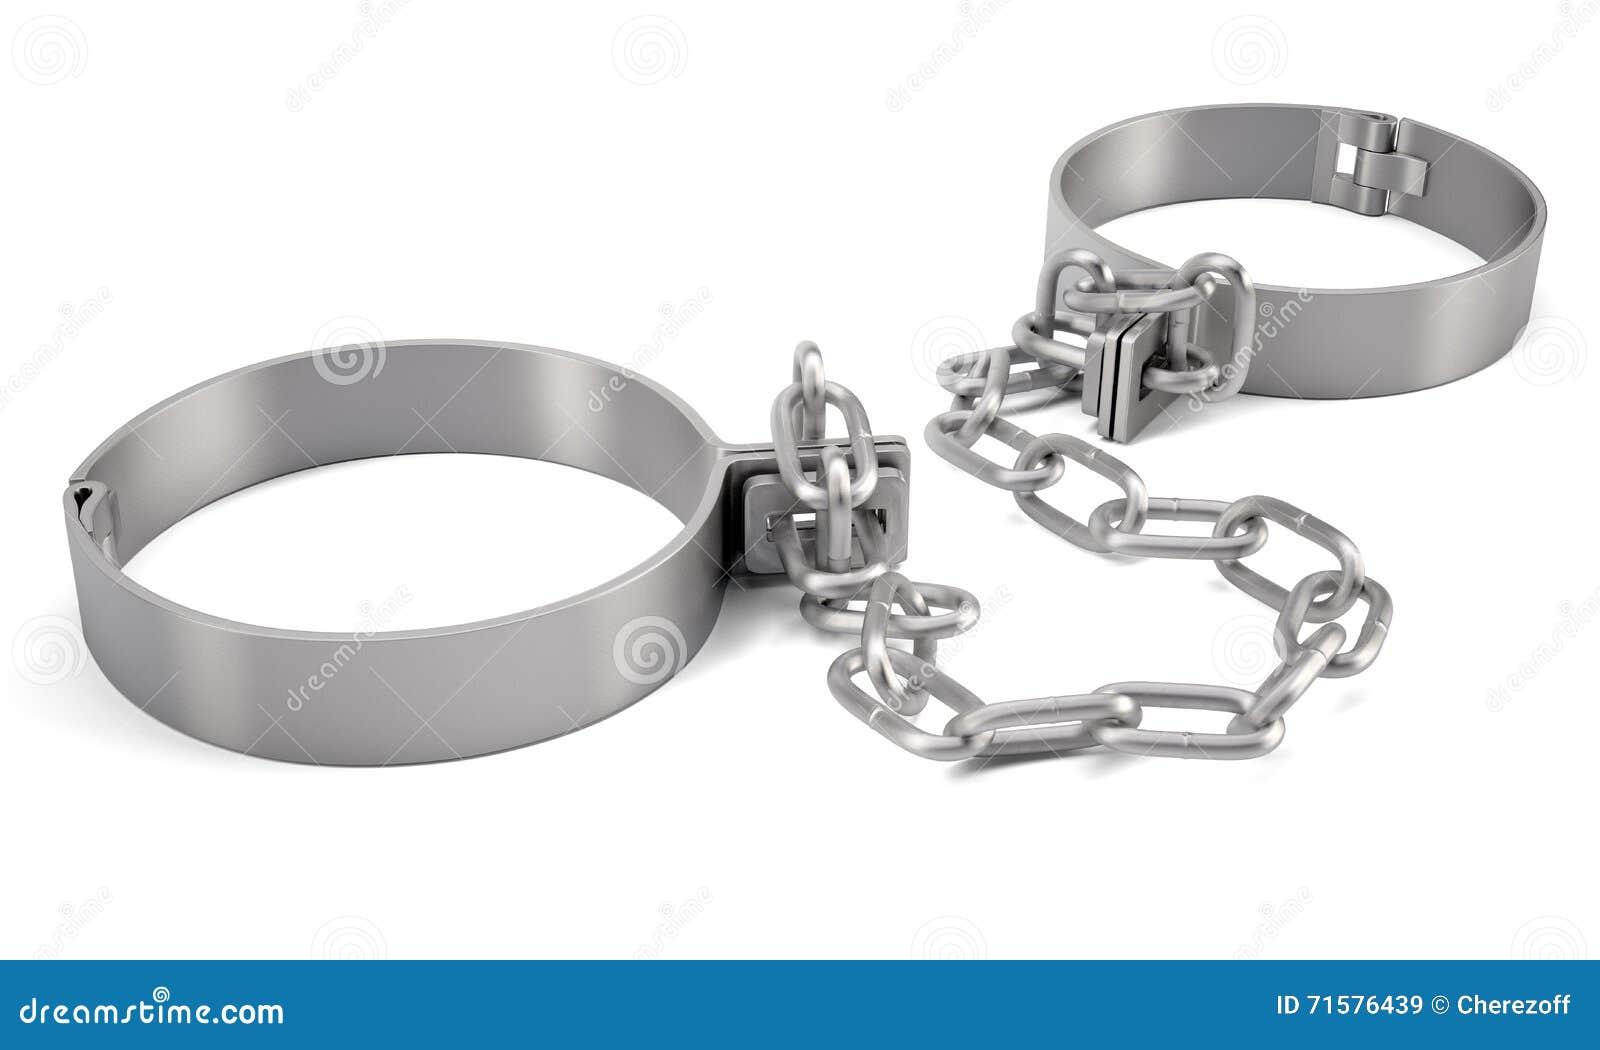 Rendered handcuffs. 3d rendering